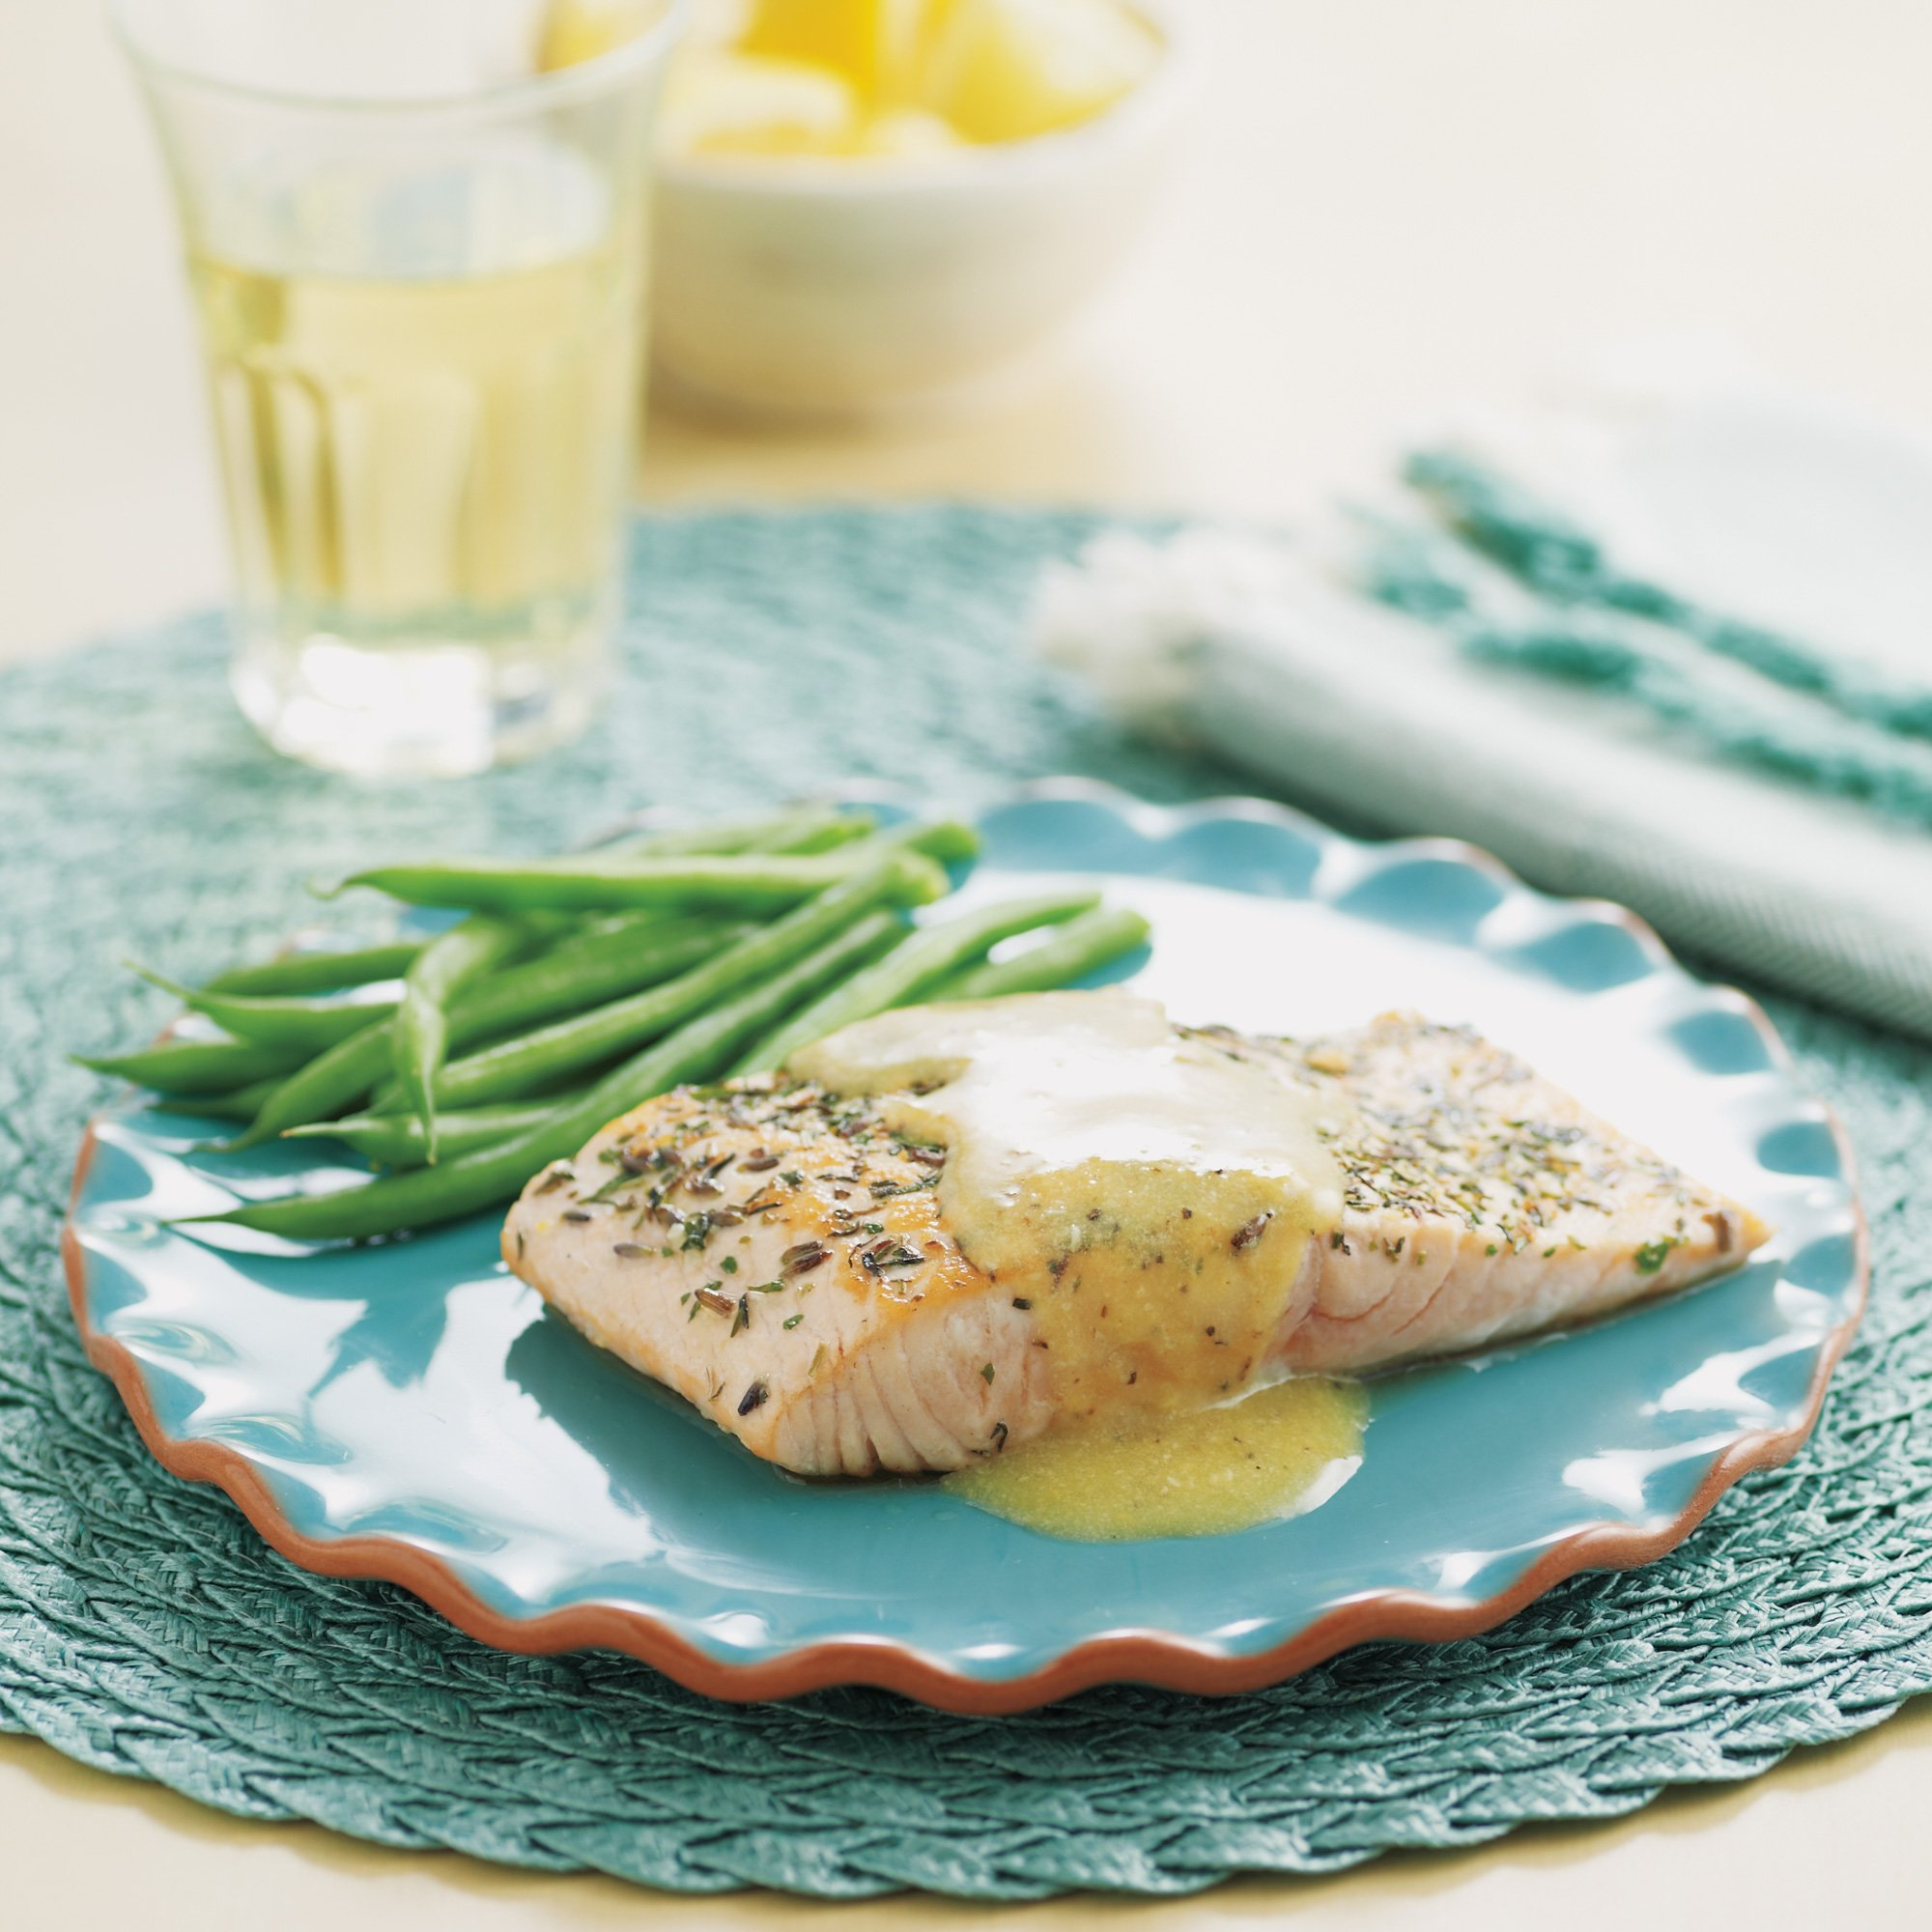 Lemon-Herb Salmon Skillet Recipe from HEB